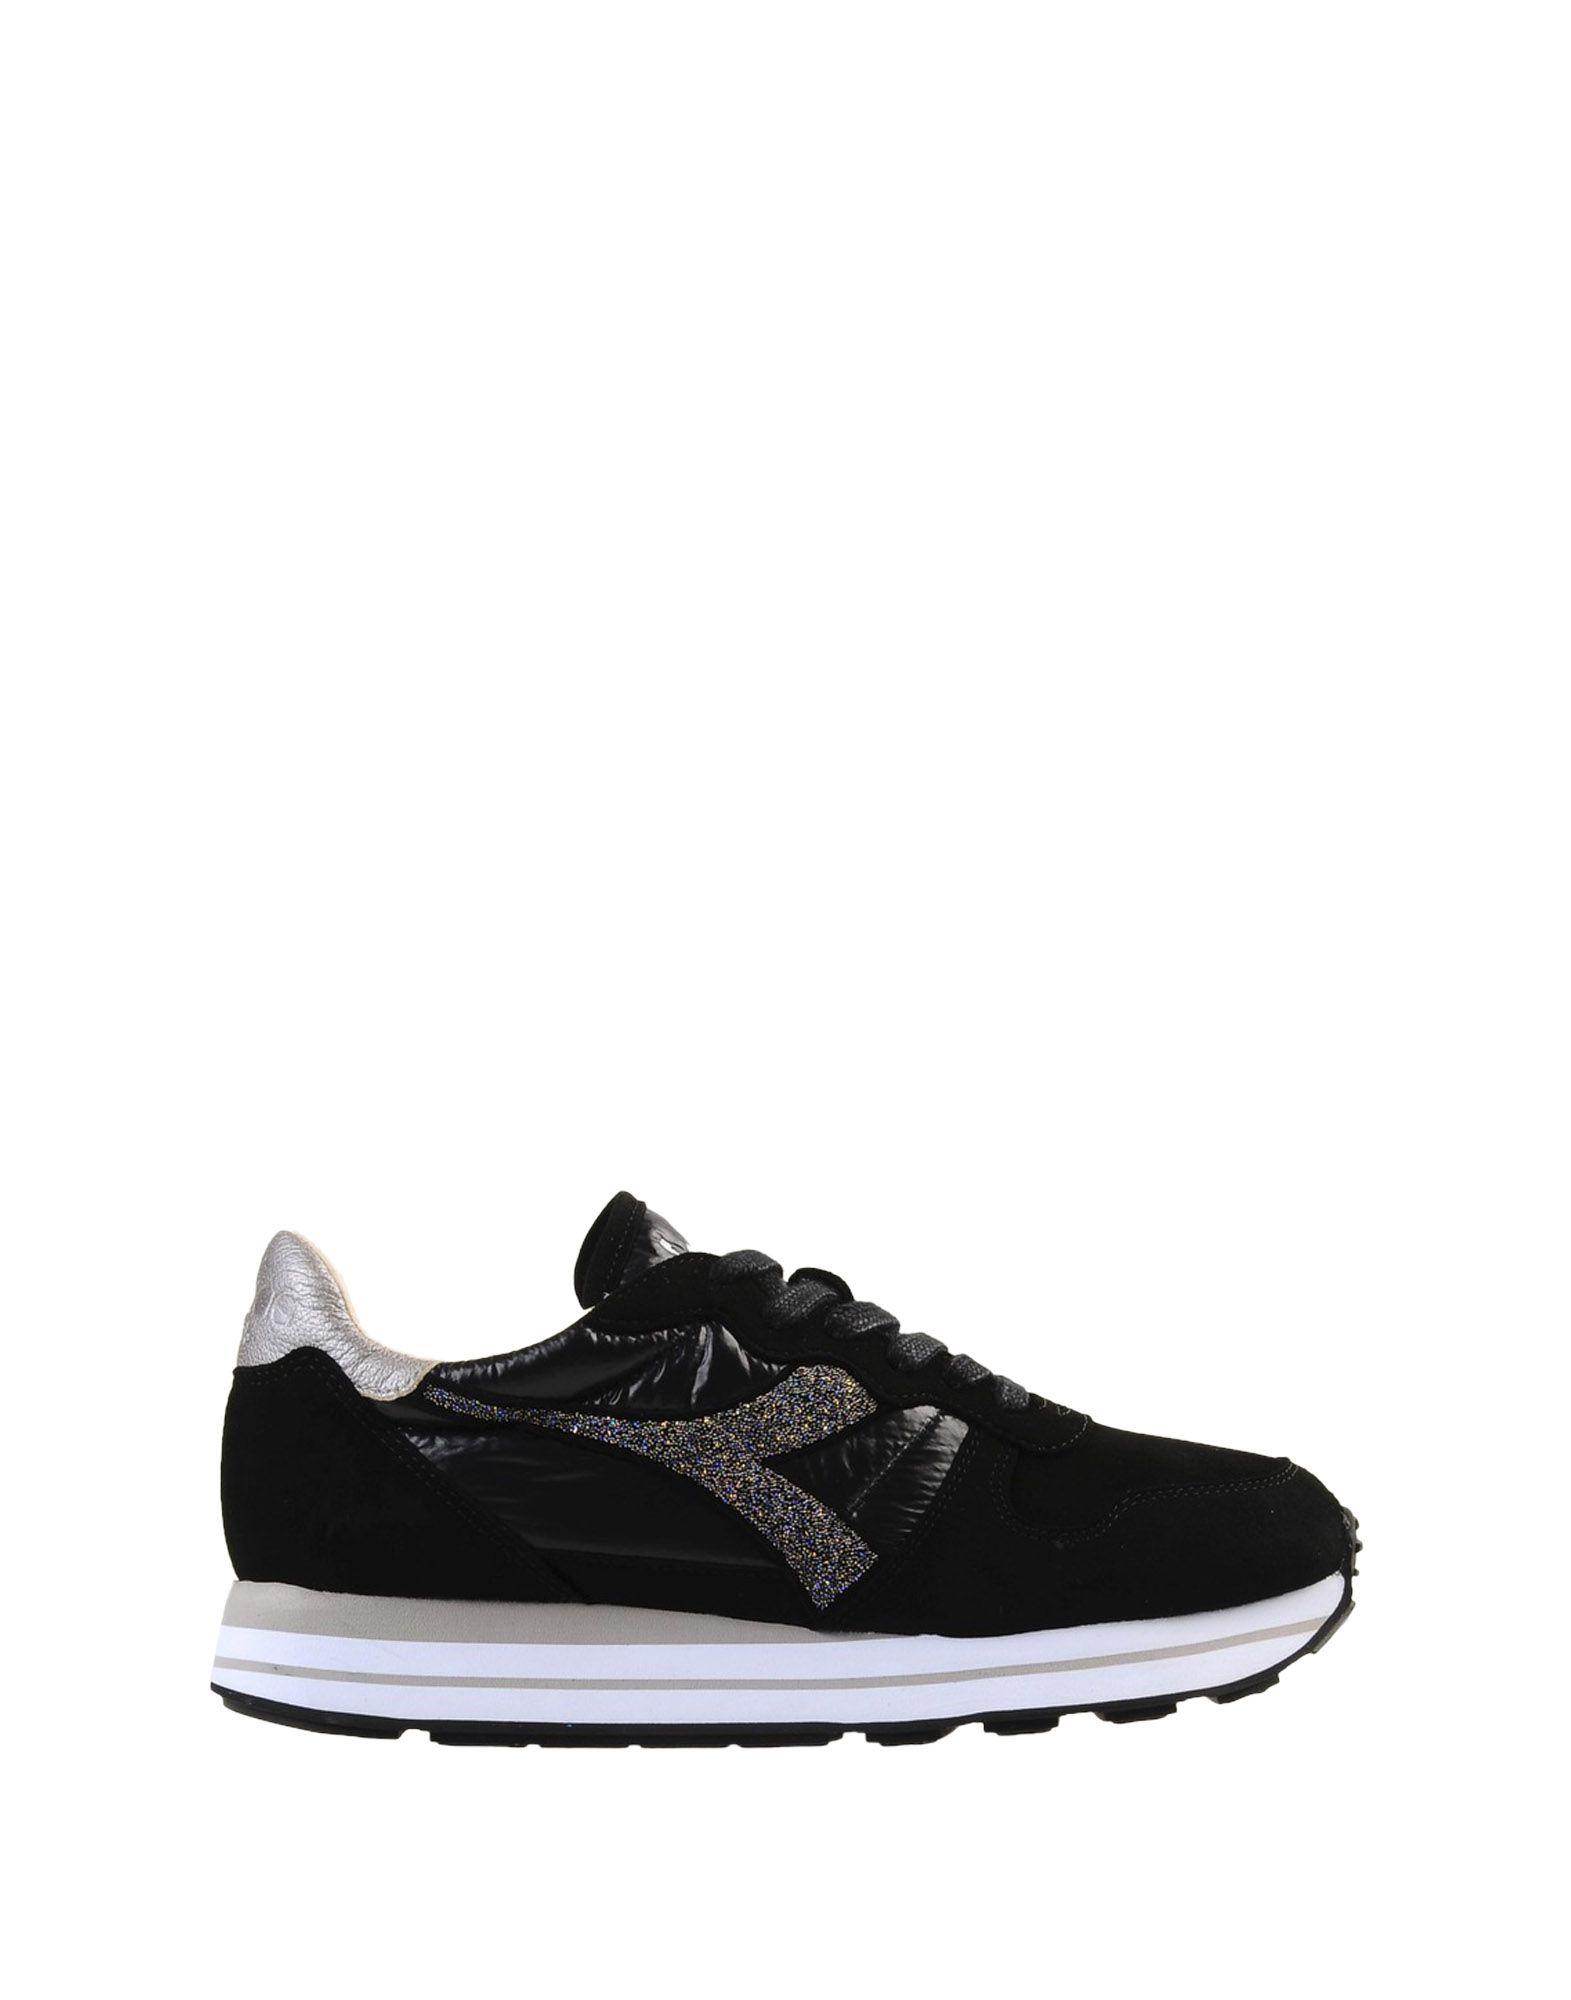 Diadora Heritage Camaro Sneakers H Ita W - Sneakers Camaro - Women Diadora Heritage Sneakers online on  Australia - 11568012IJ 46ab43